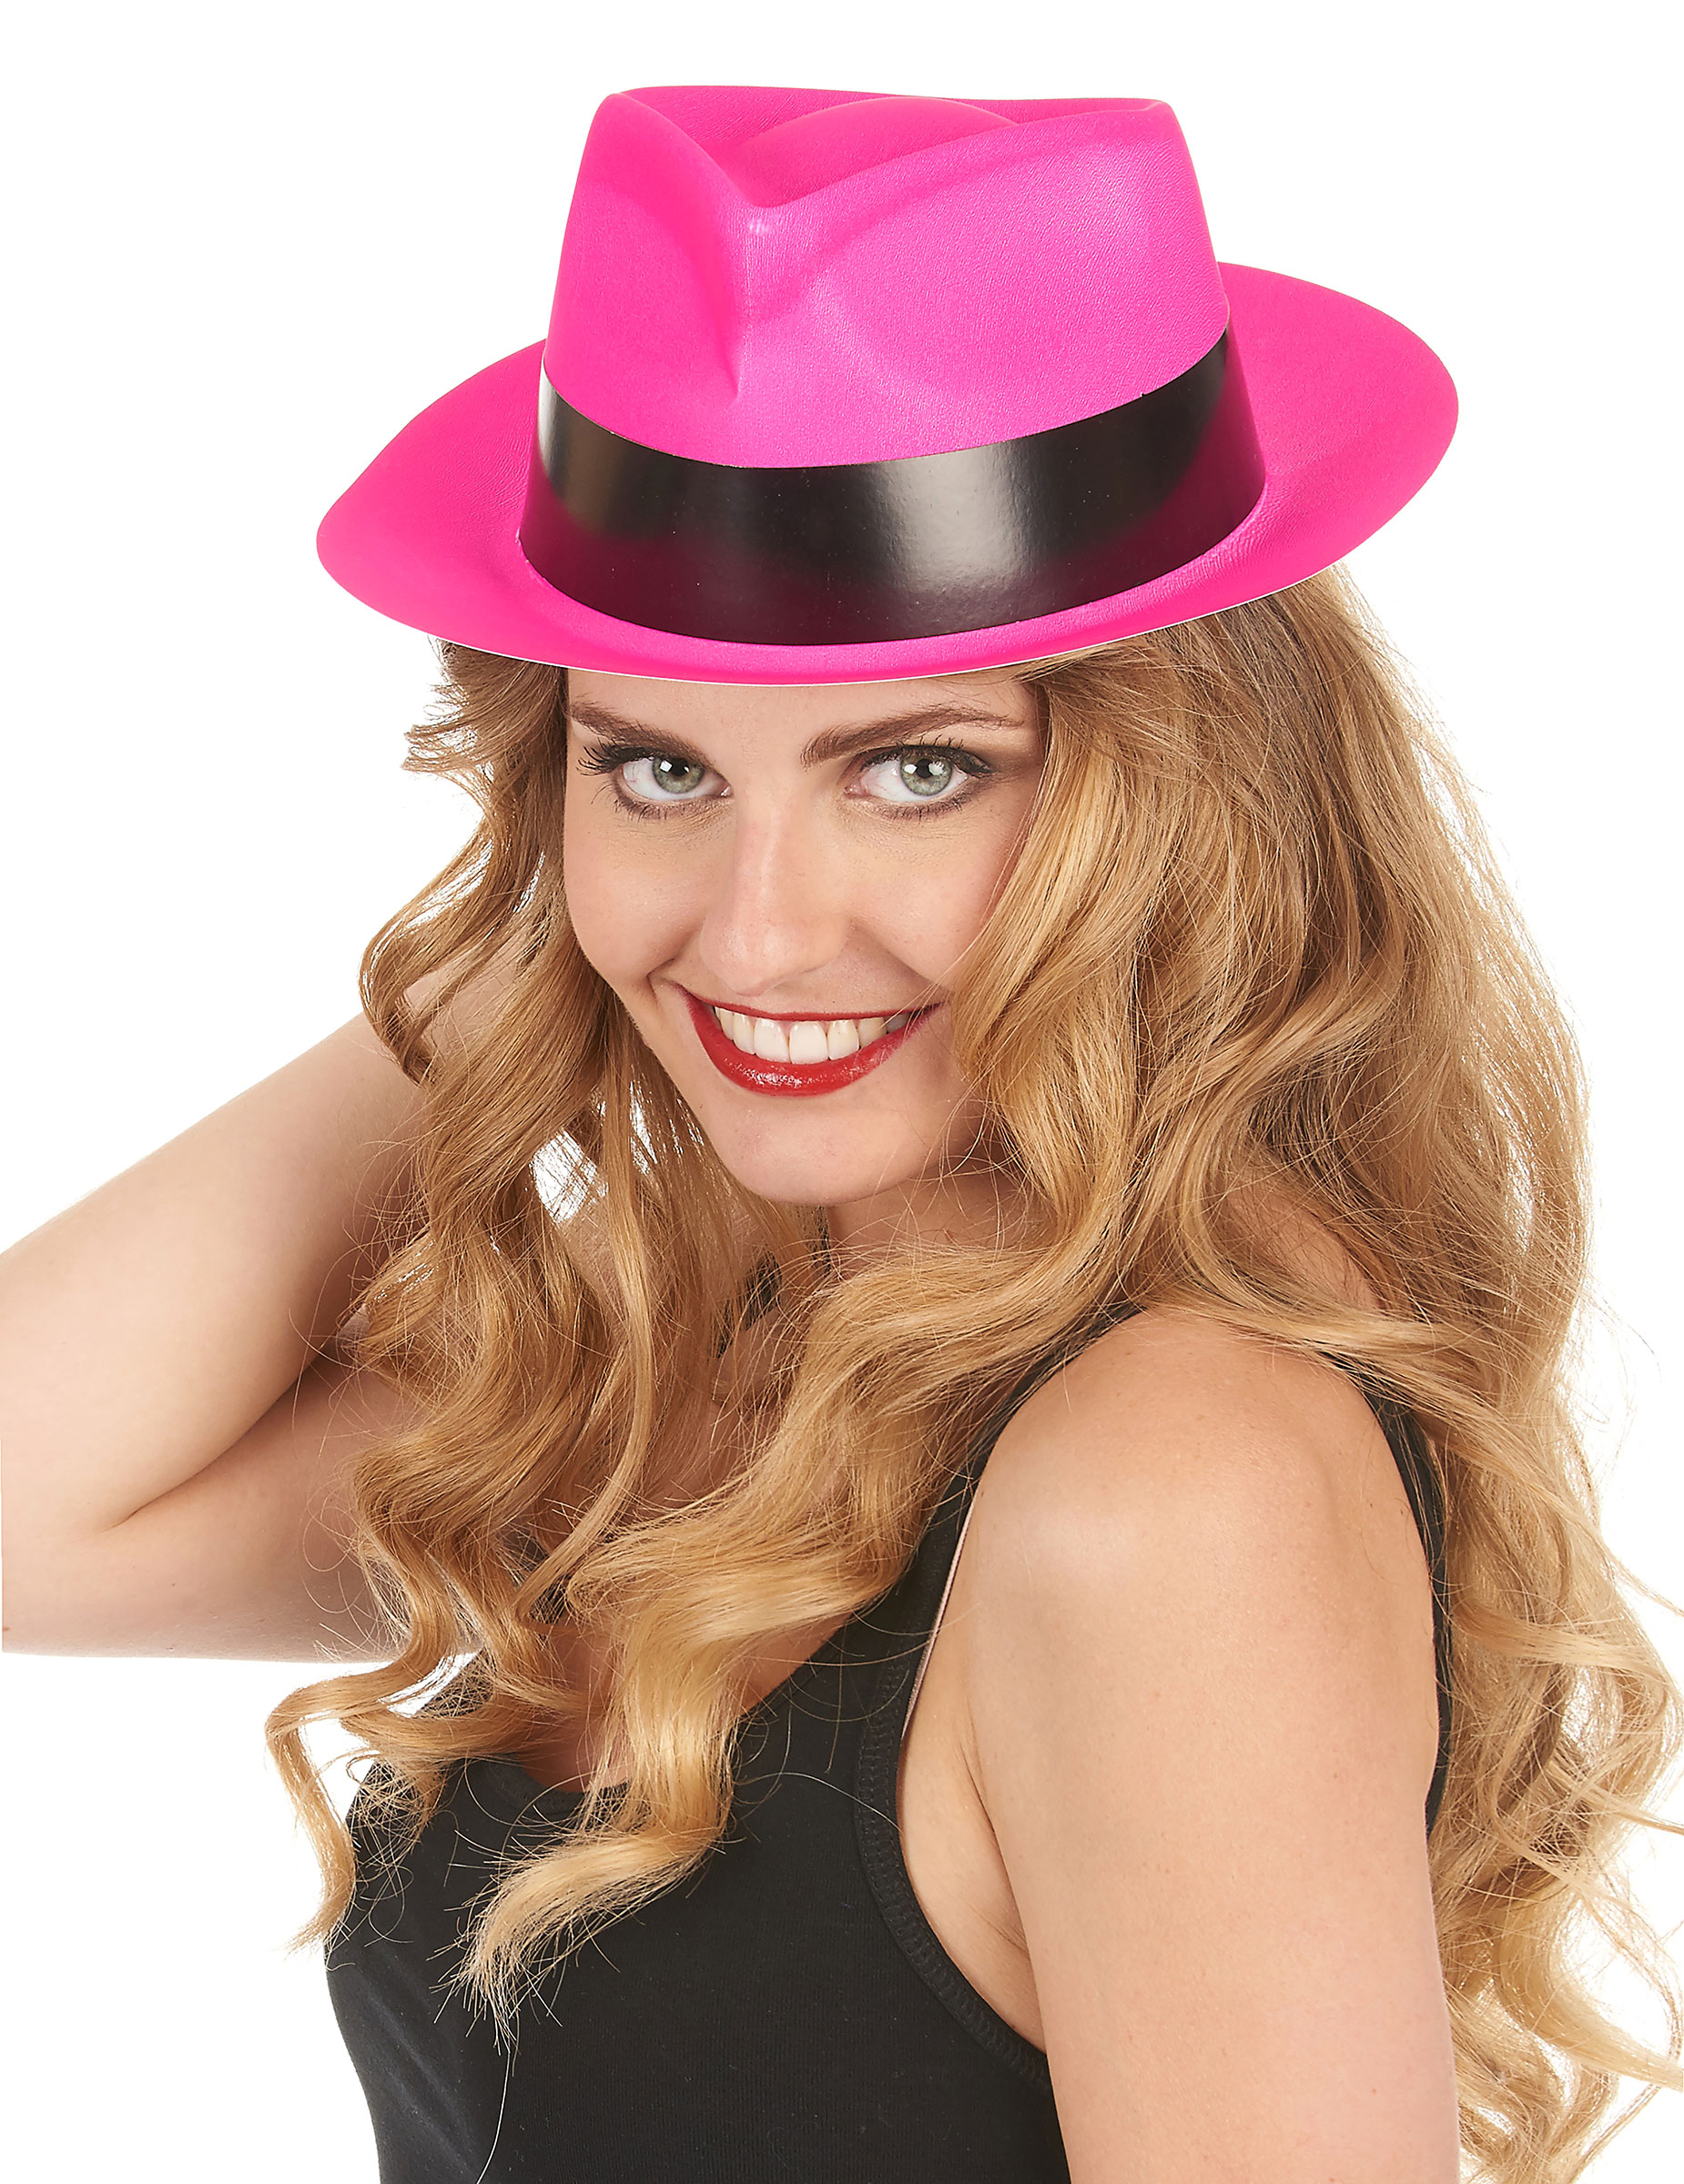 Party Hut neonrosa für Erwachsene - stylishe Accessoires bei VEGAOO